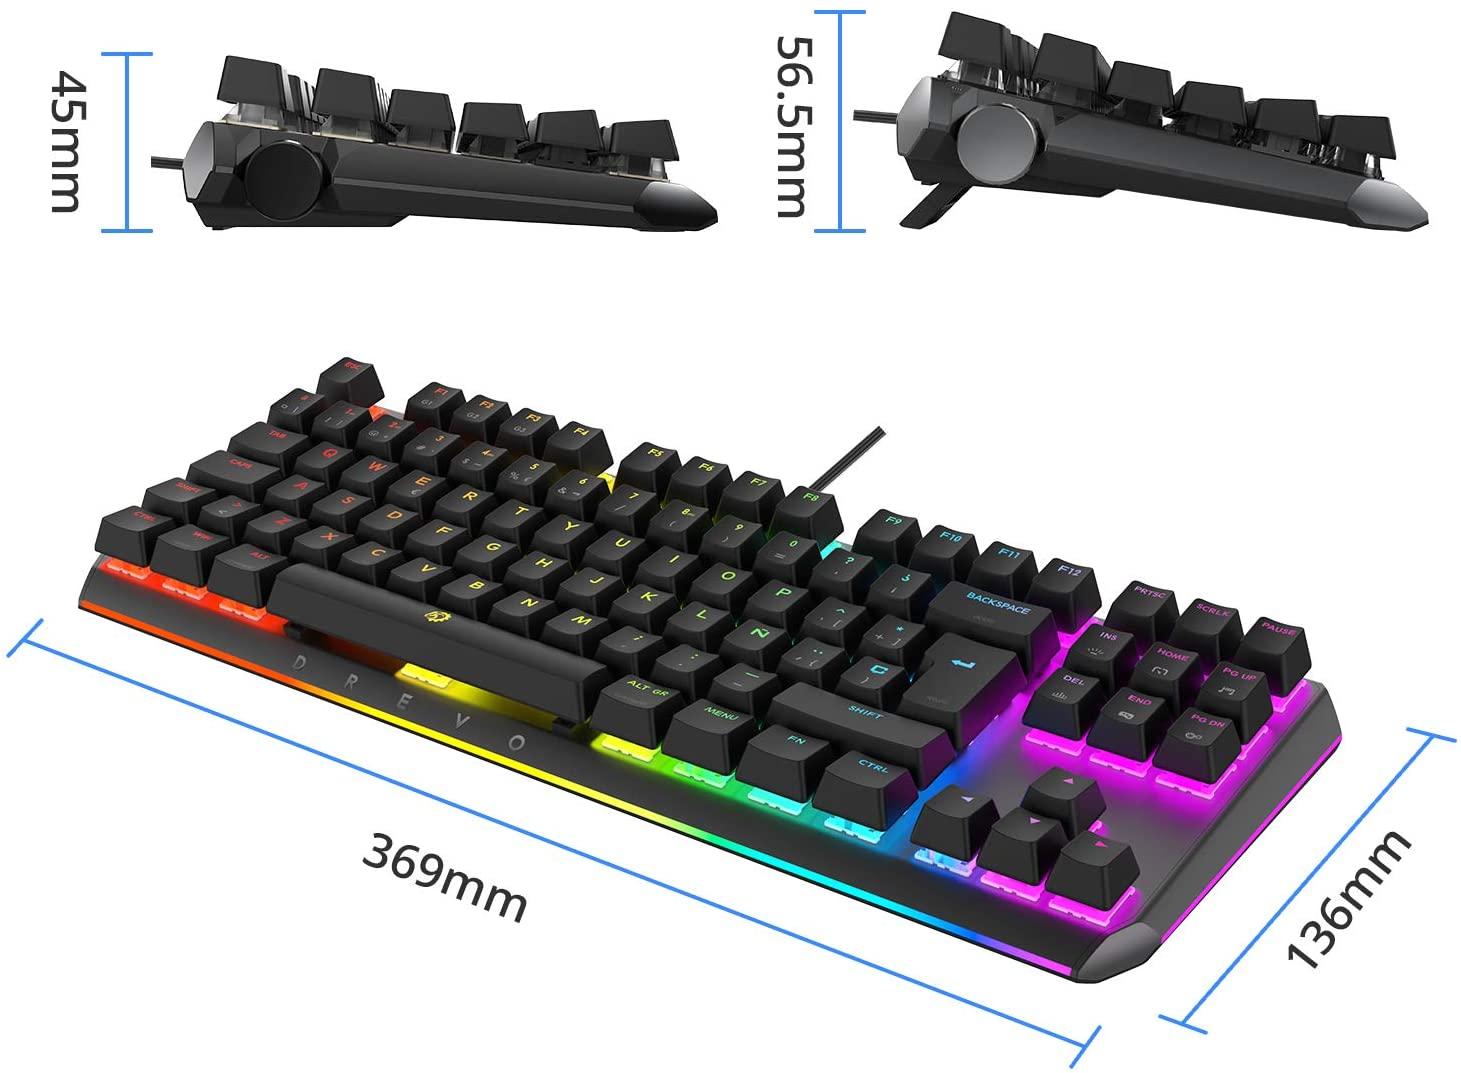 DREVO BladeMaster TE Teclado Mecánico Gaming Radi RGB Retroiluminado, USB con Cable, Genius Knob Programable-88K